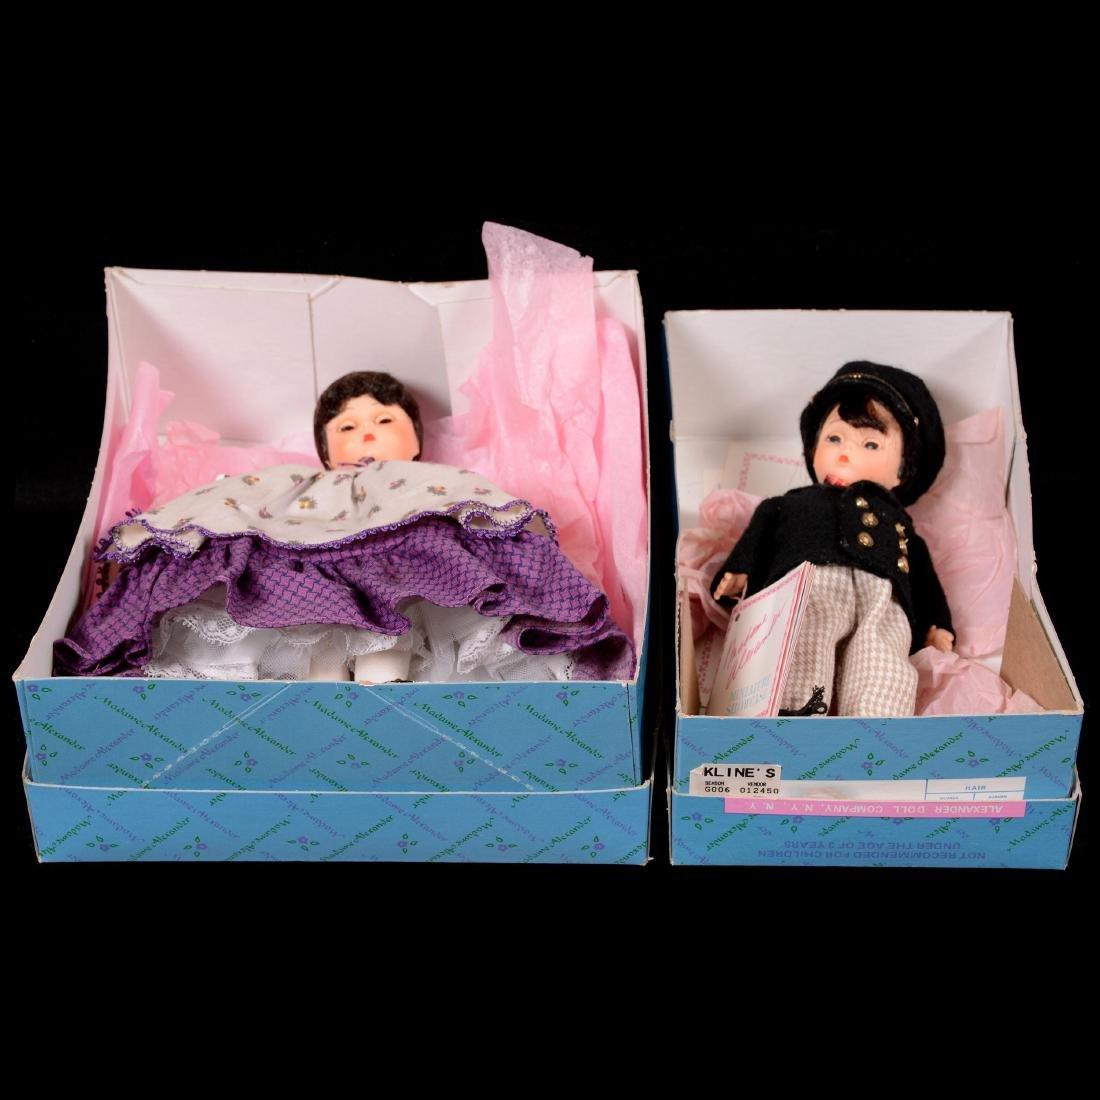 Ten Madame Alexander Dolls in Original Boxes - 4